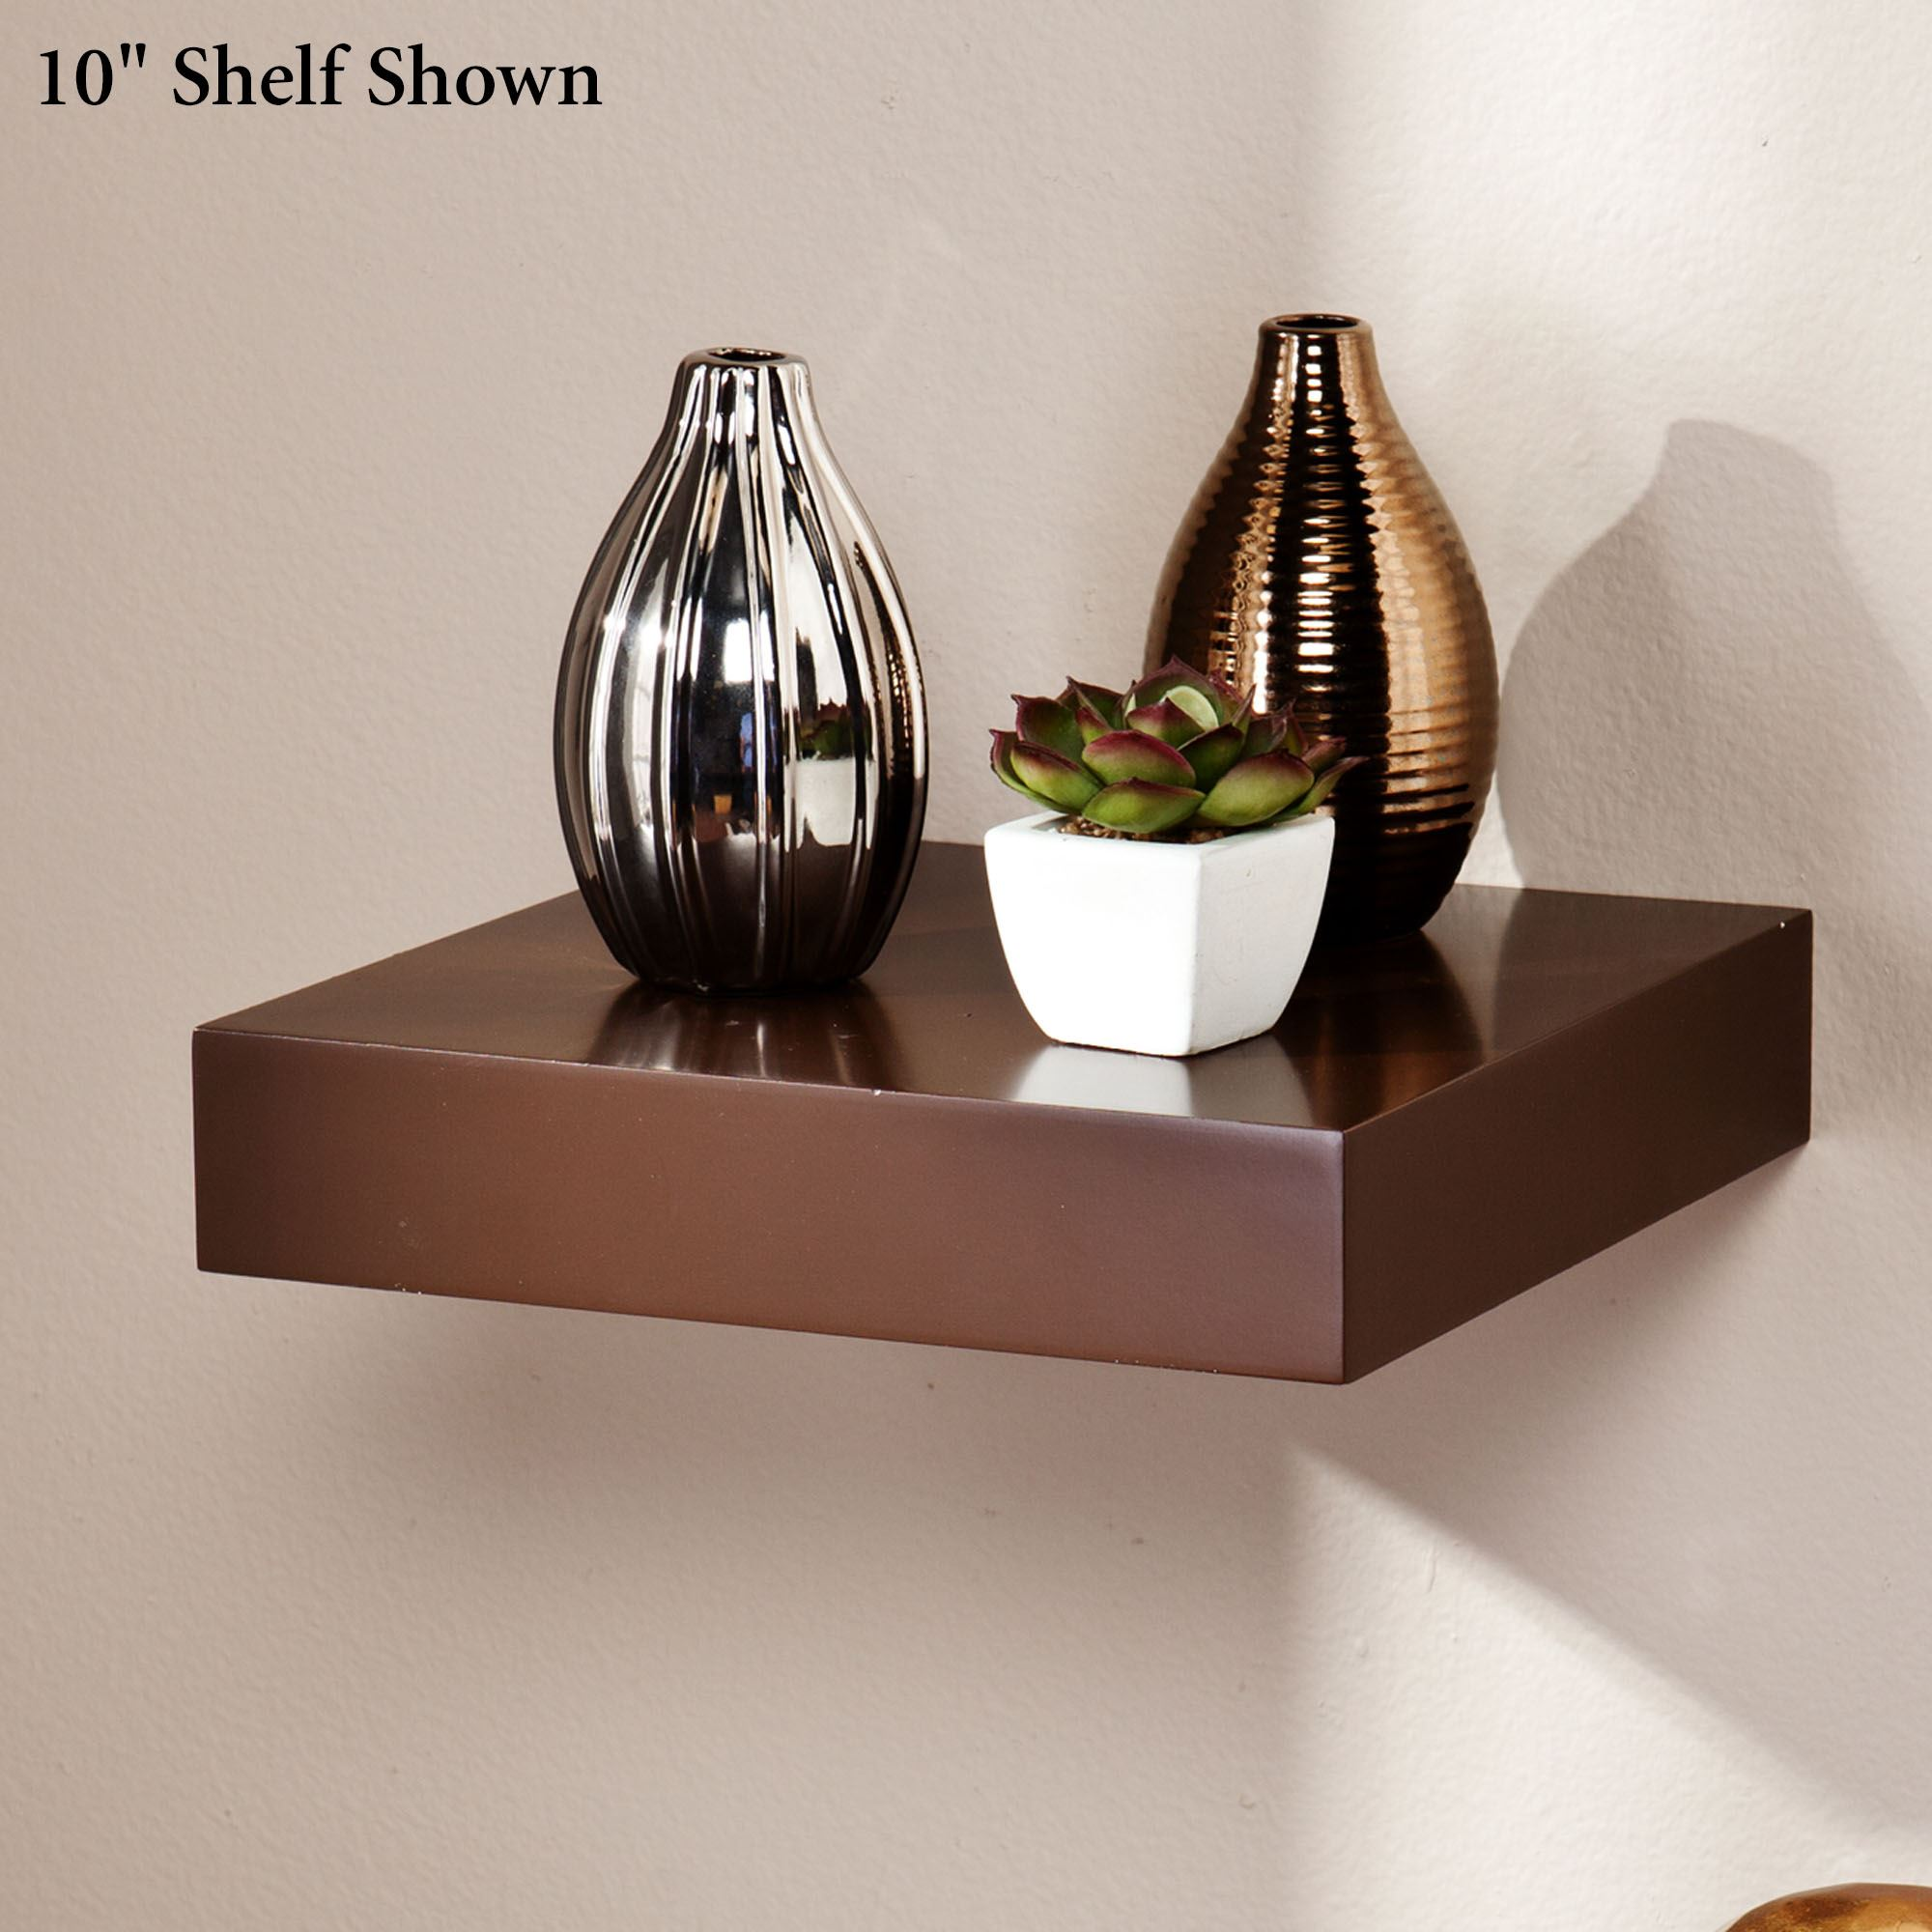 Manhattan Brown Wooden Floating Wall Shelves